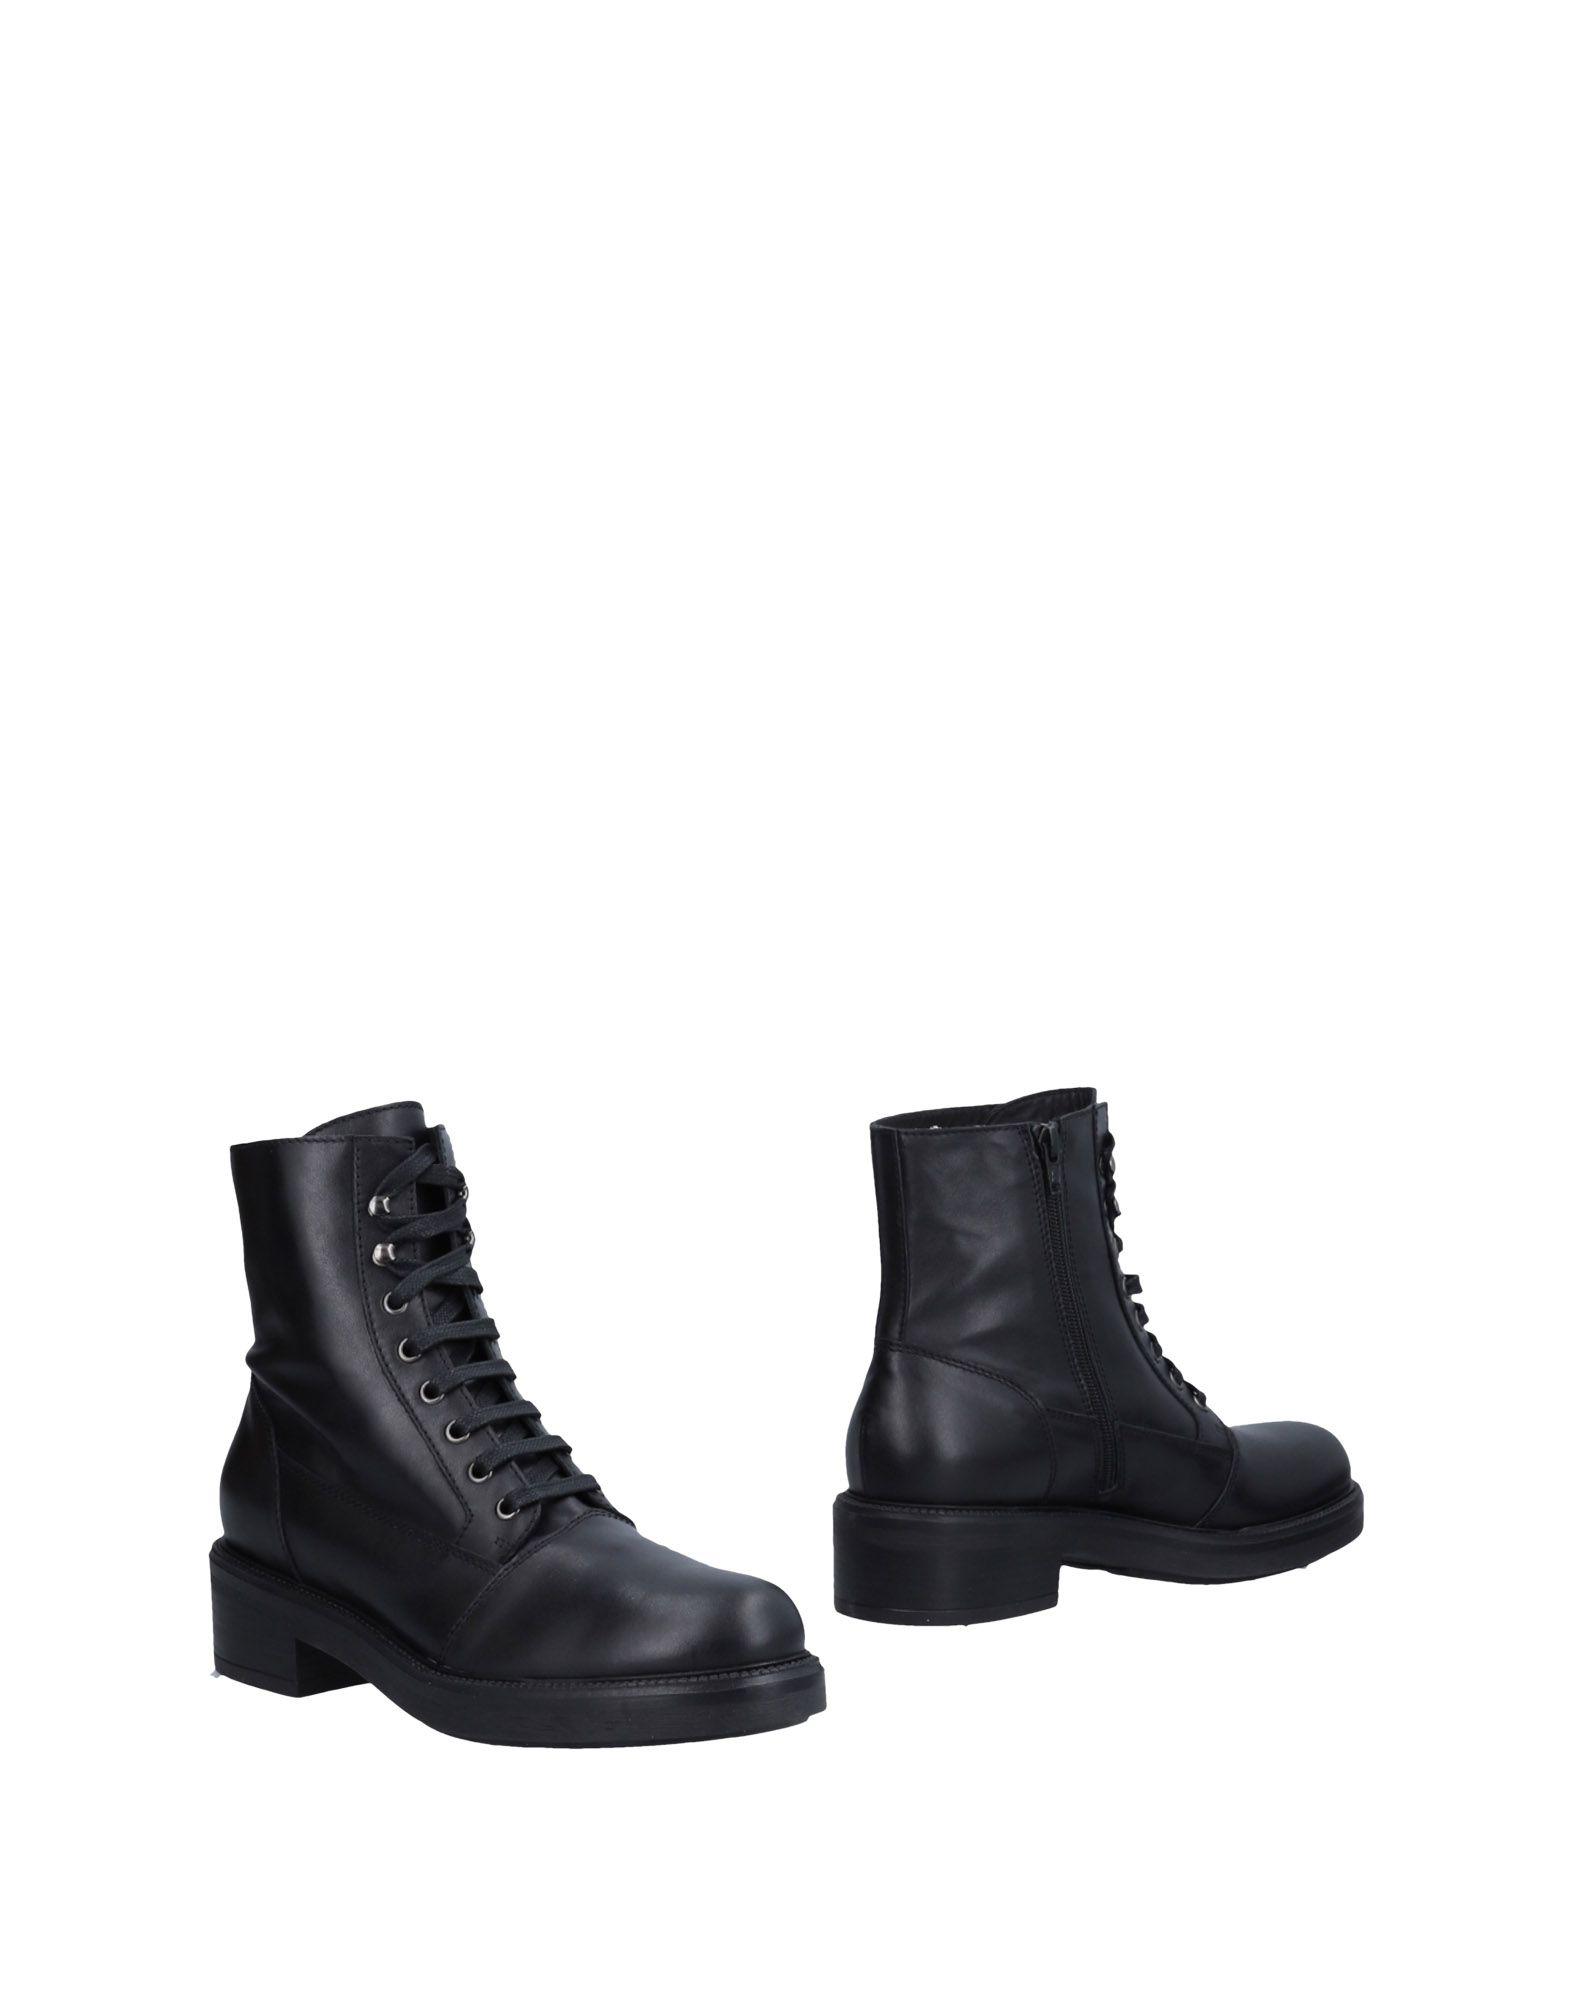 Jeannot Ankle Boot - Women Jeannot Ankle Boots online 11491261BP on  Australia - 11491261BP online b0df70